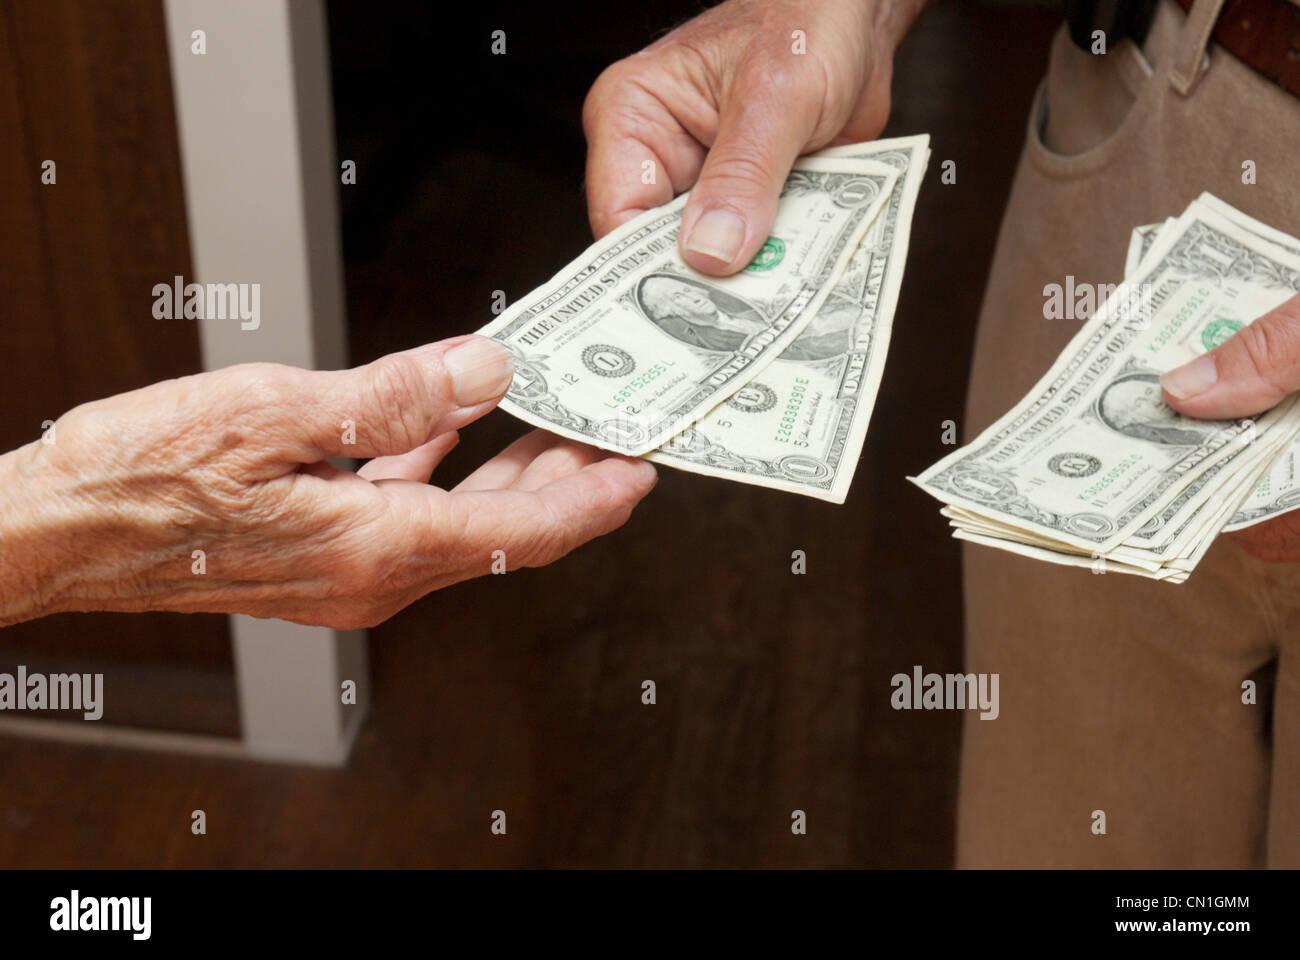 Older Man Handing Dollar Bills to Woman - Stock Image